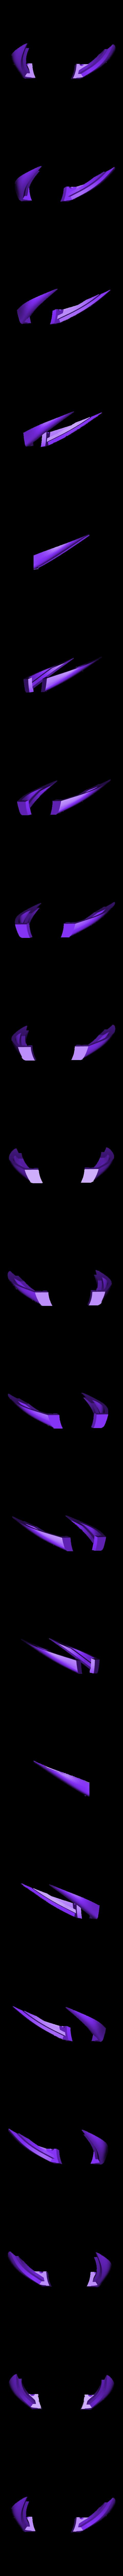 OpenRC_2017_MCL_Center_Color_2.stl Download free STL file OpenRC F1 Dual Color McLaren Edition • 3D printer model, DanielNoree